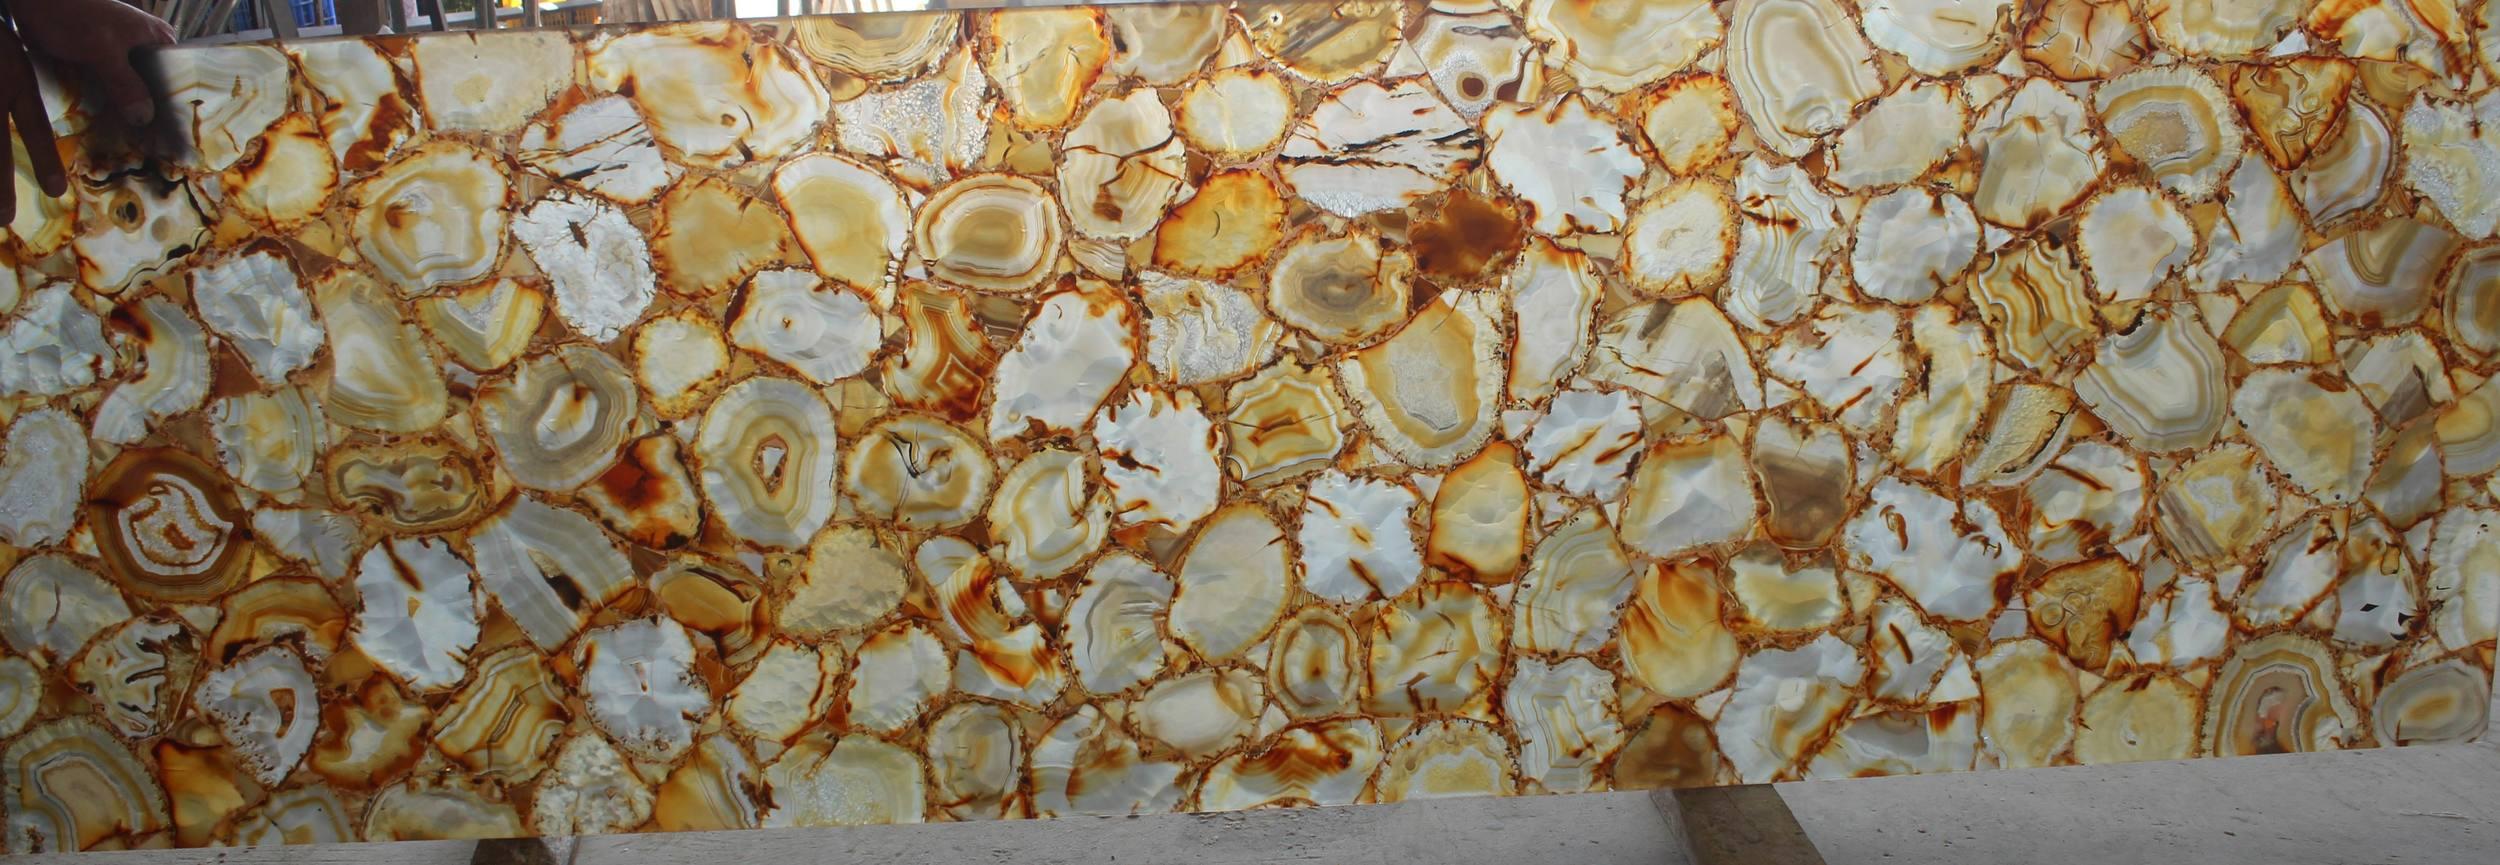 yellow silk agate panel.jpg